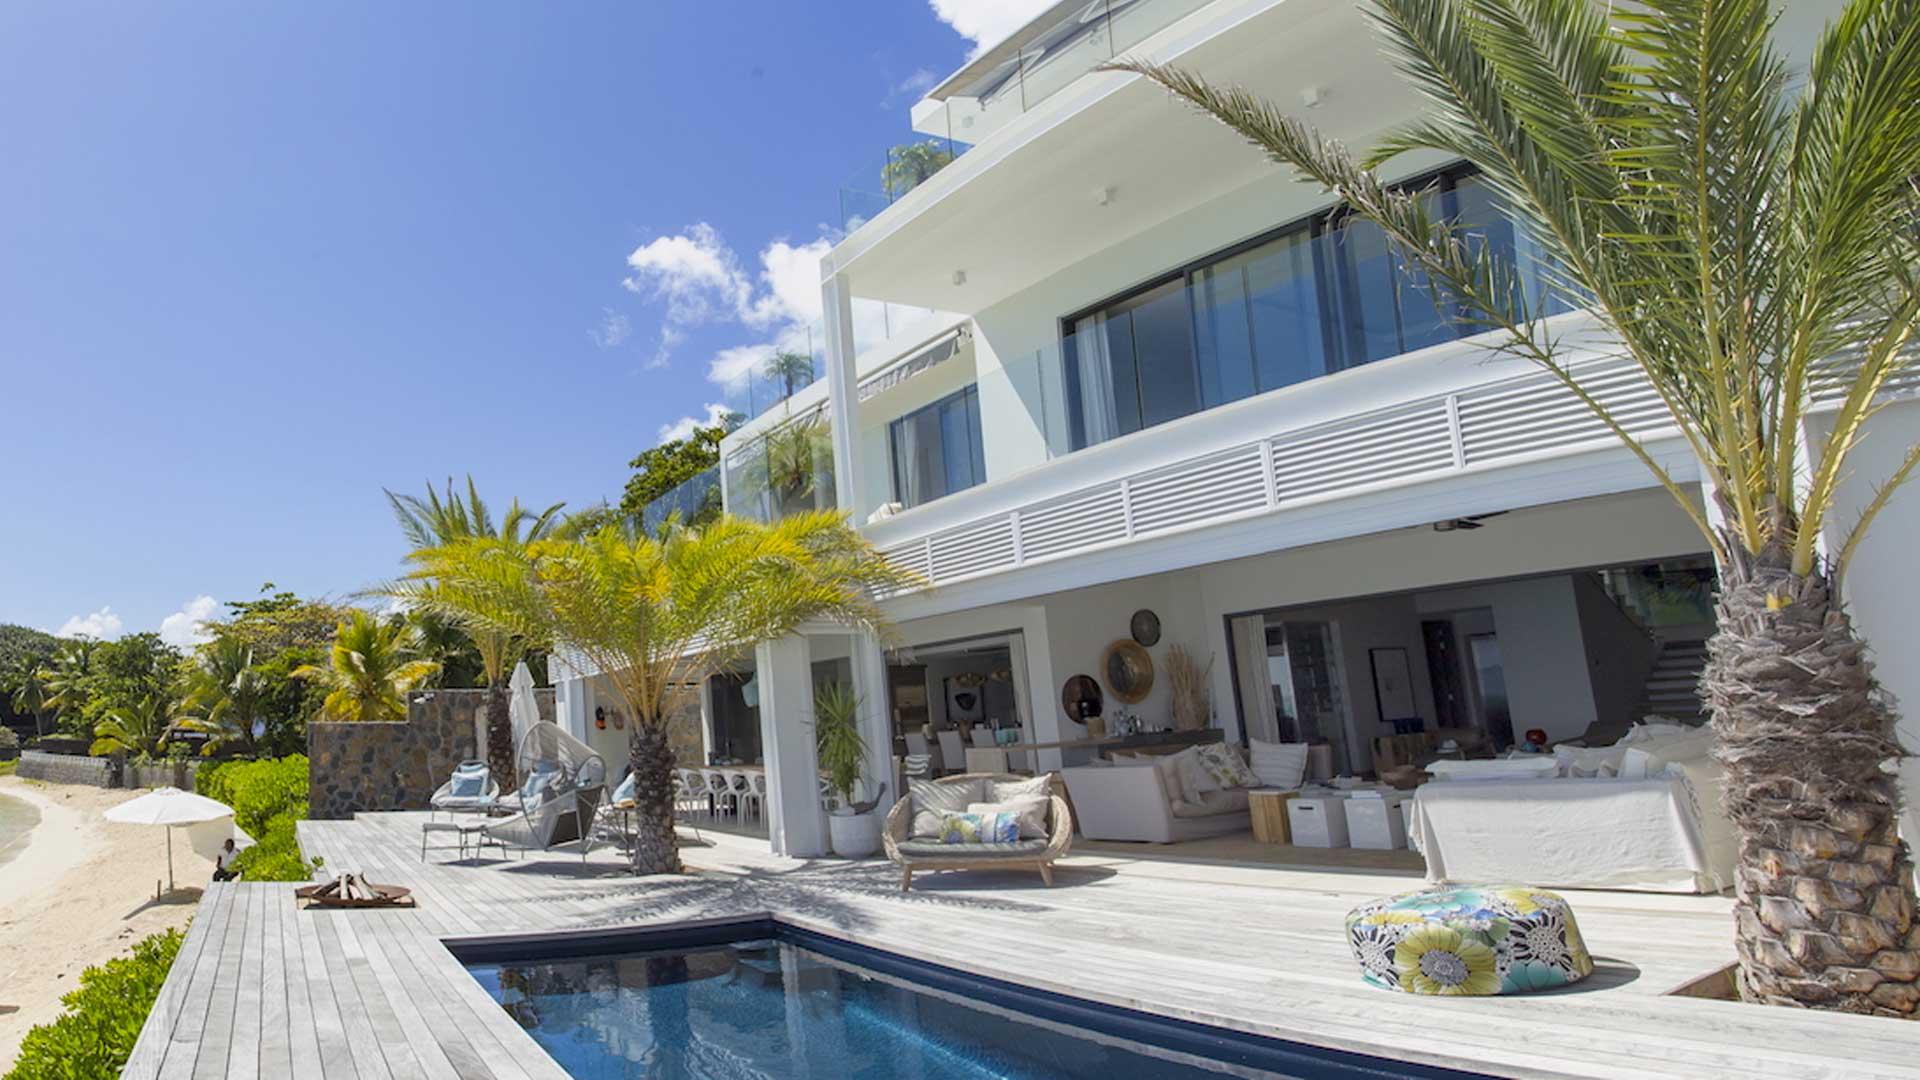 Villa royale villa rental in mauritius north grand baie for Villa royale